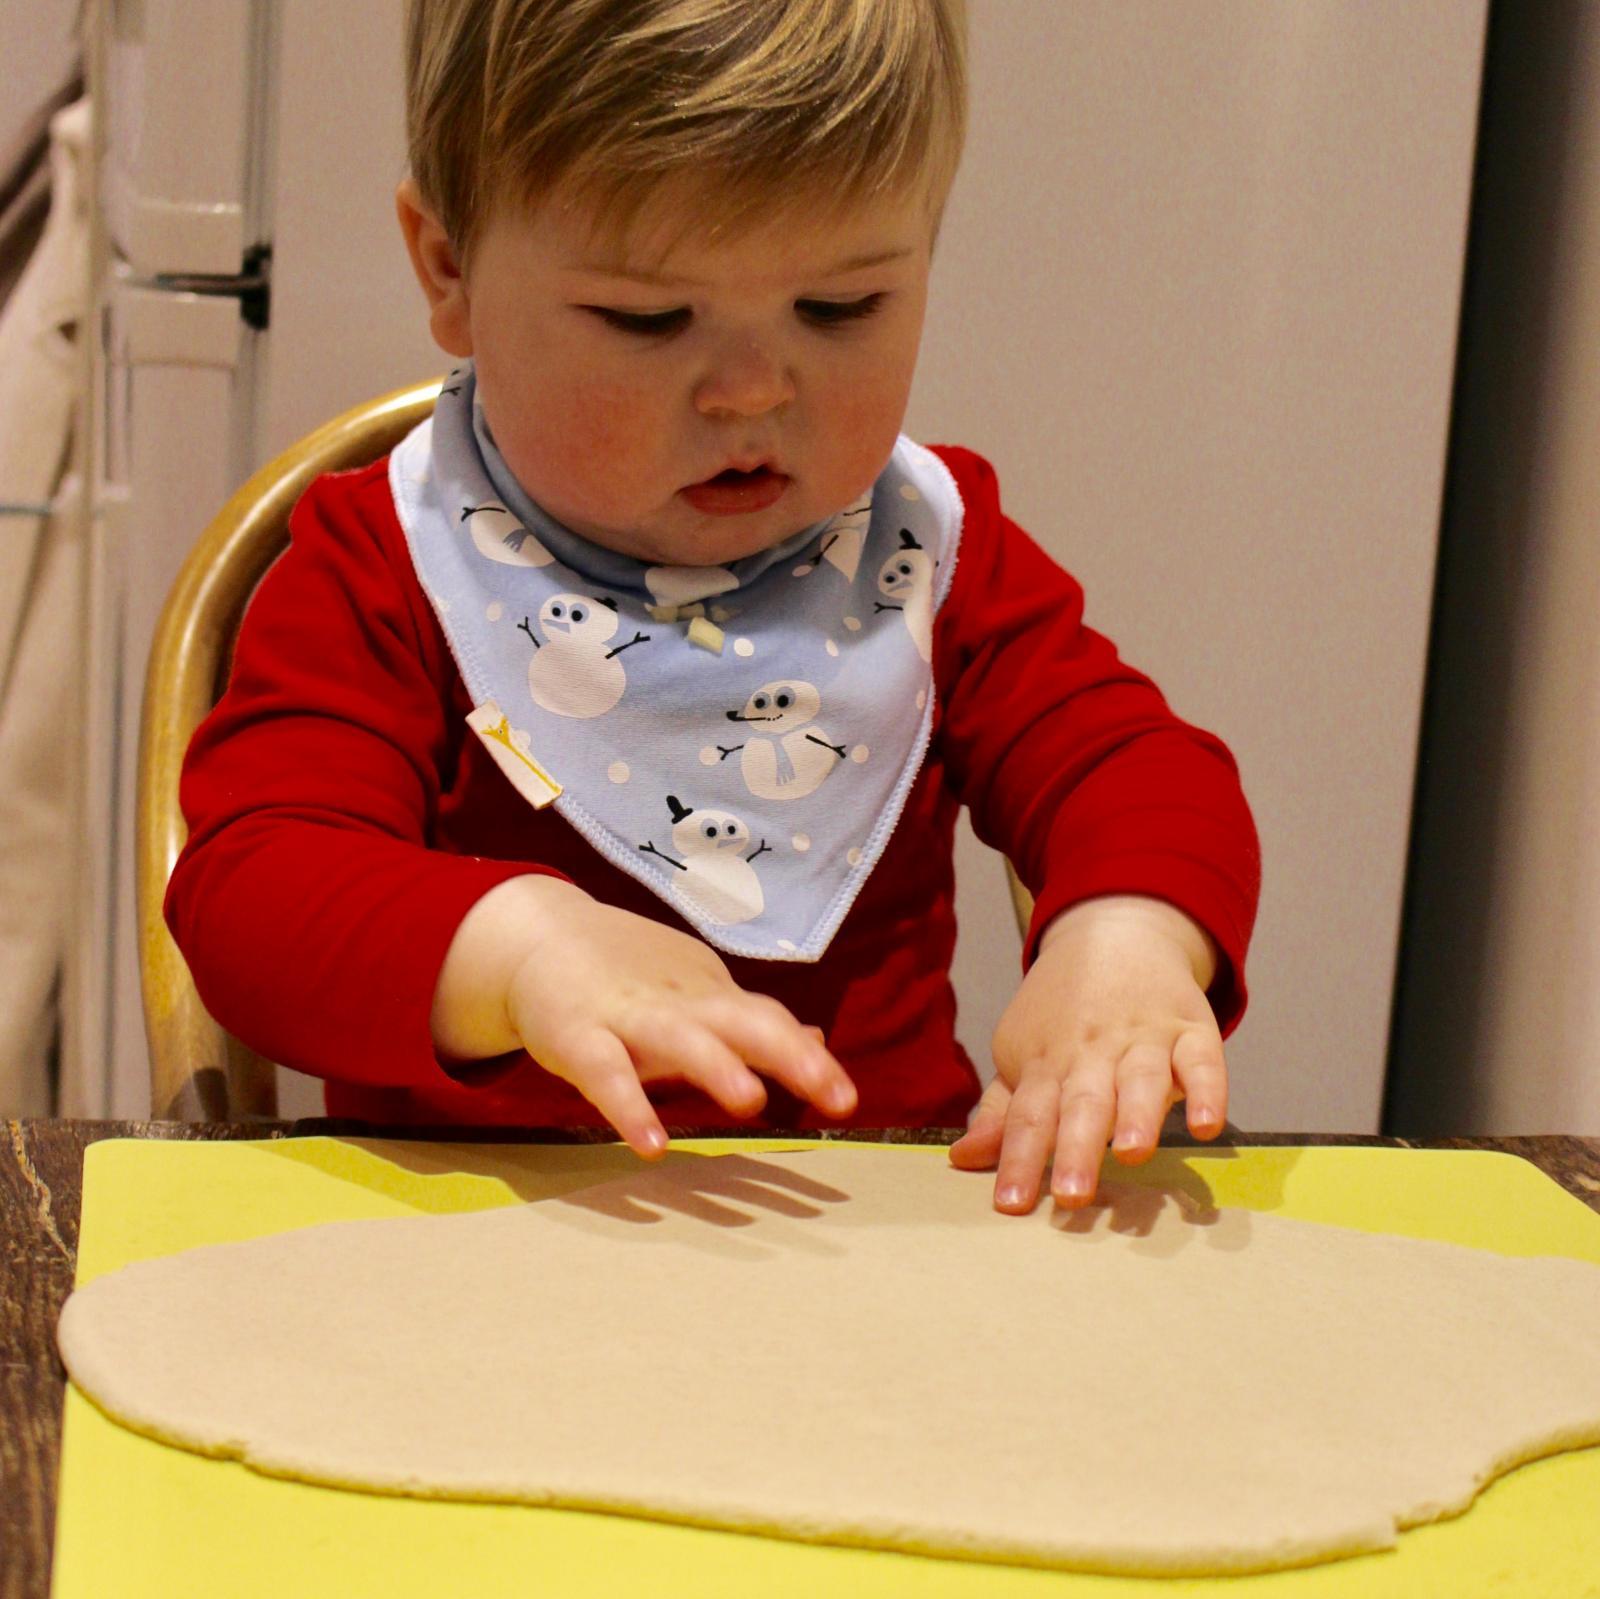 Salt Dough Handprint Decorations - ready for handprints